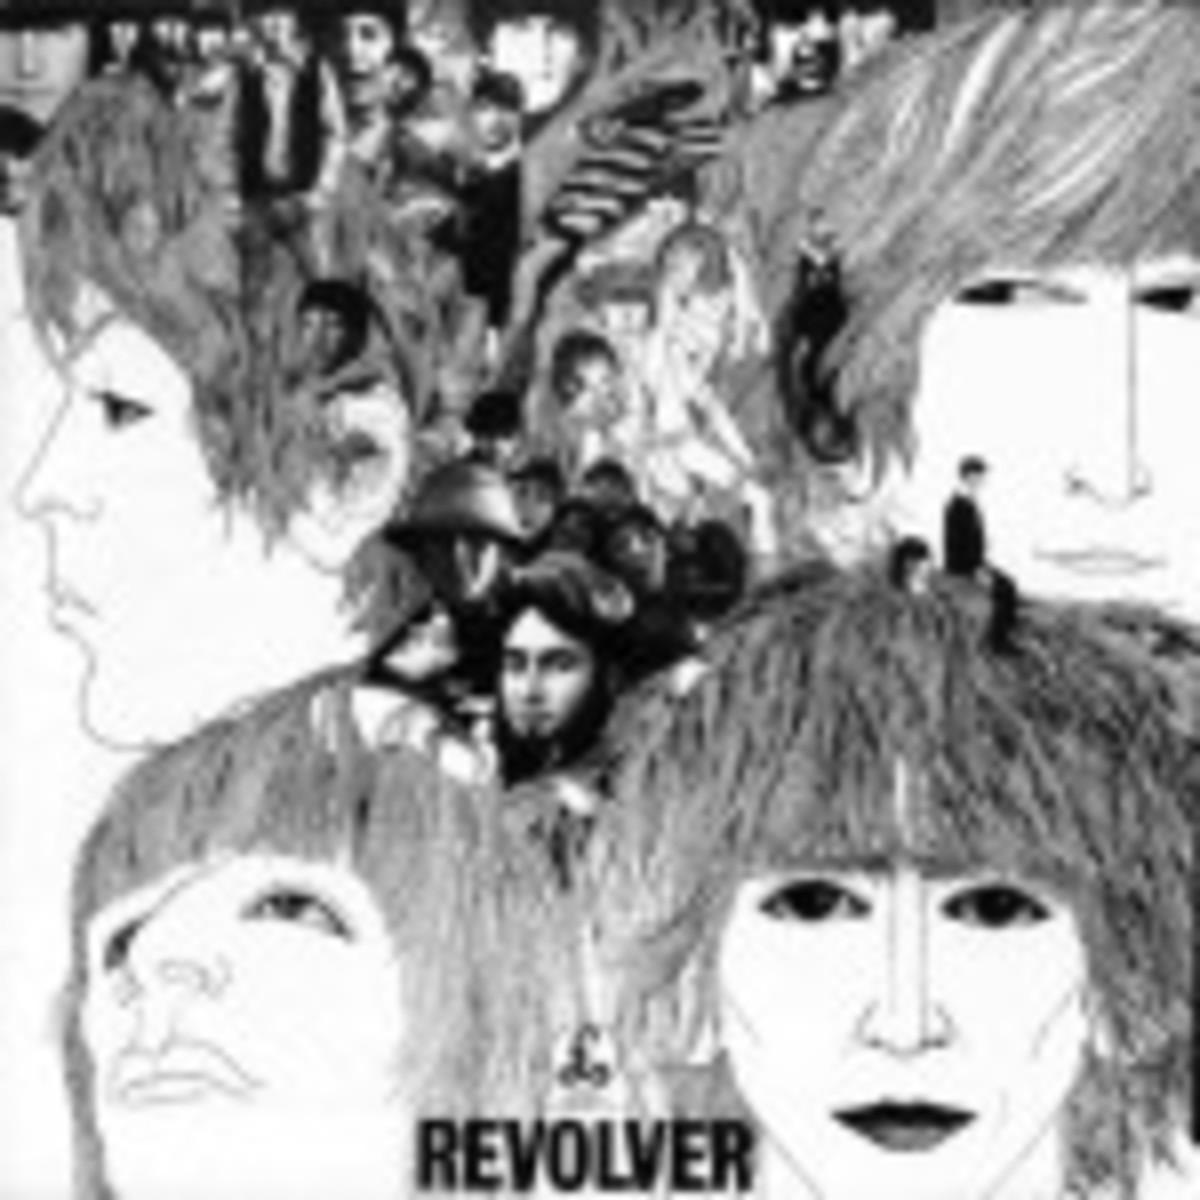 Beatles_Revolver_web